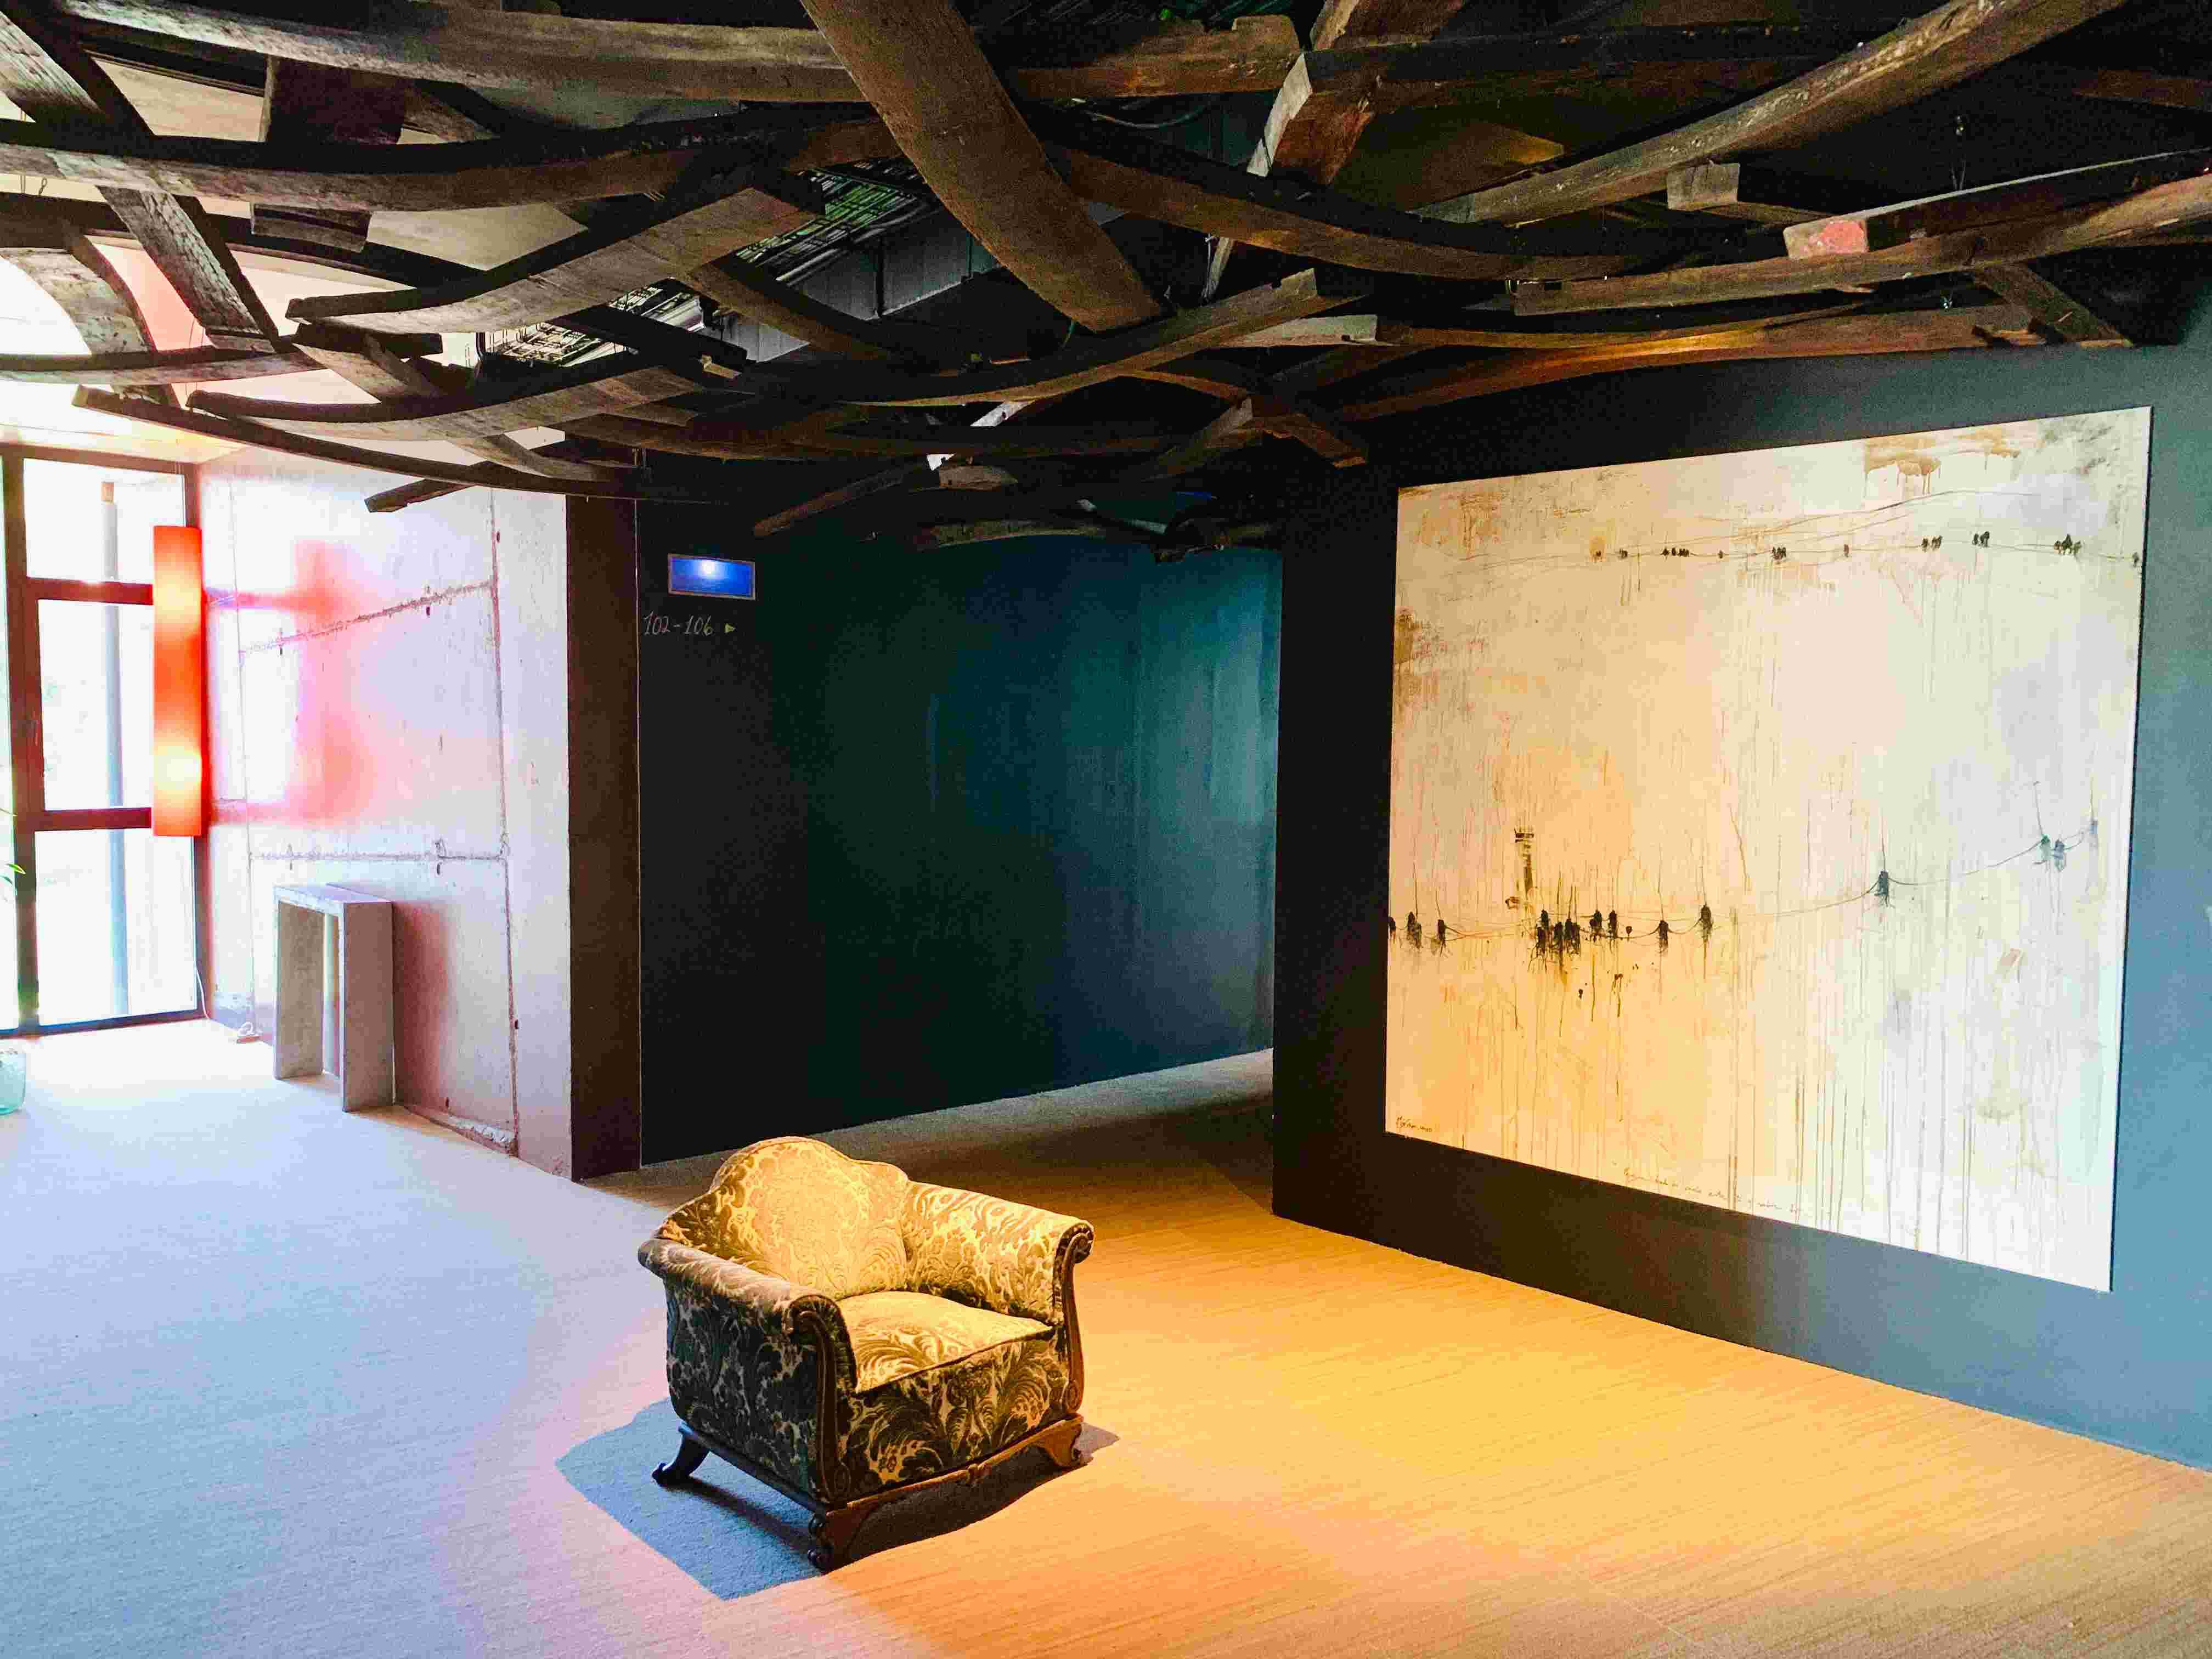 Art-design Hotel in Basque Country